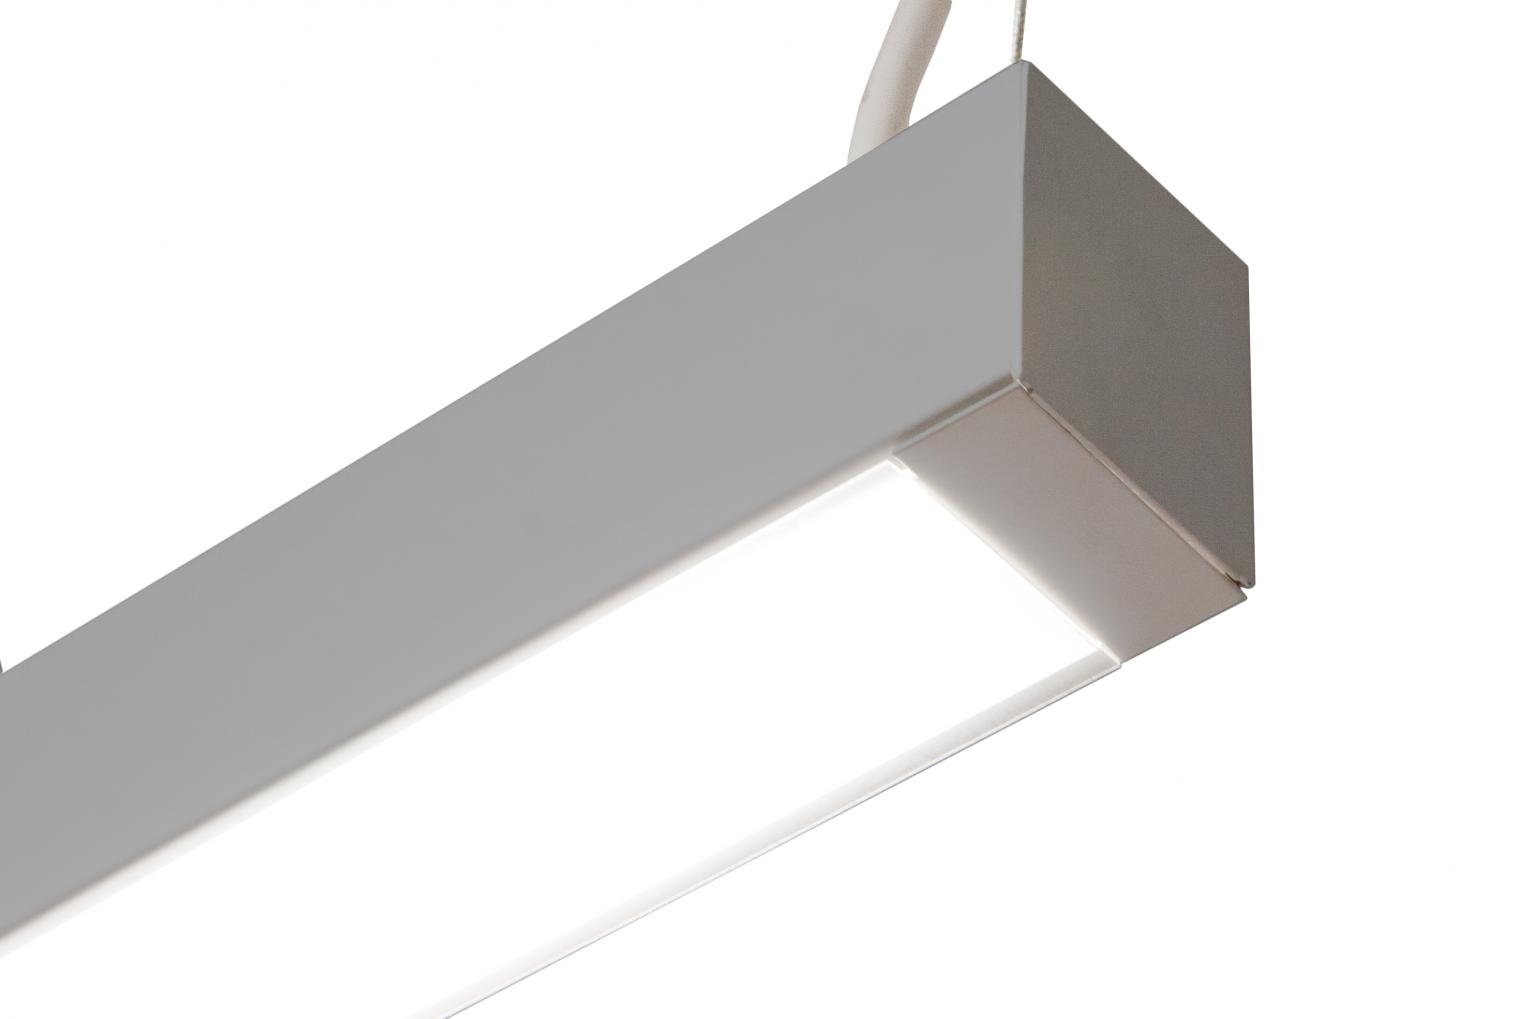 Alcon lighting beam 253 series 12145 8 led 25 inch aperture 8 foot reviews arubaitofo Images